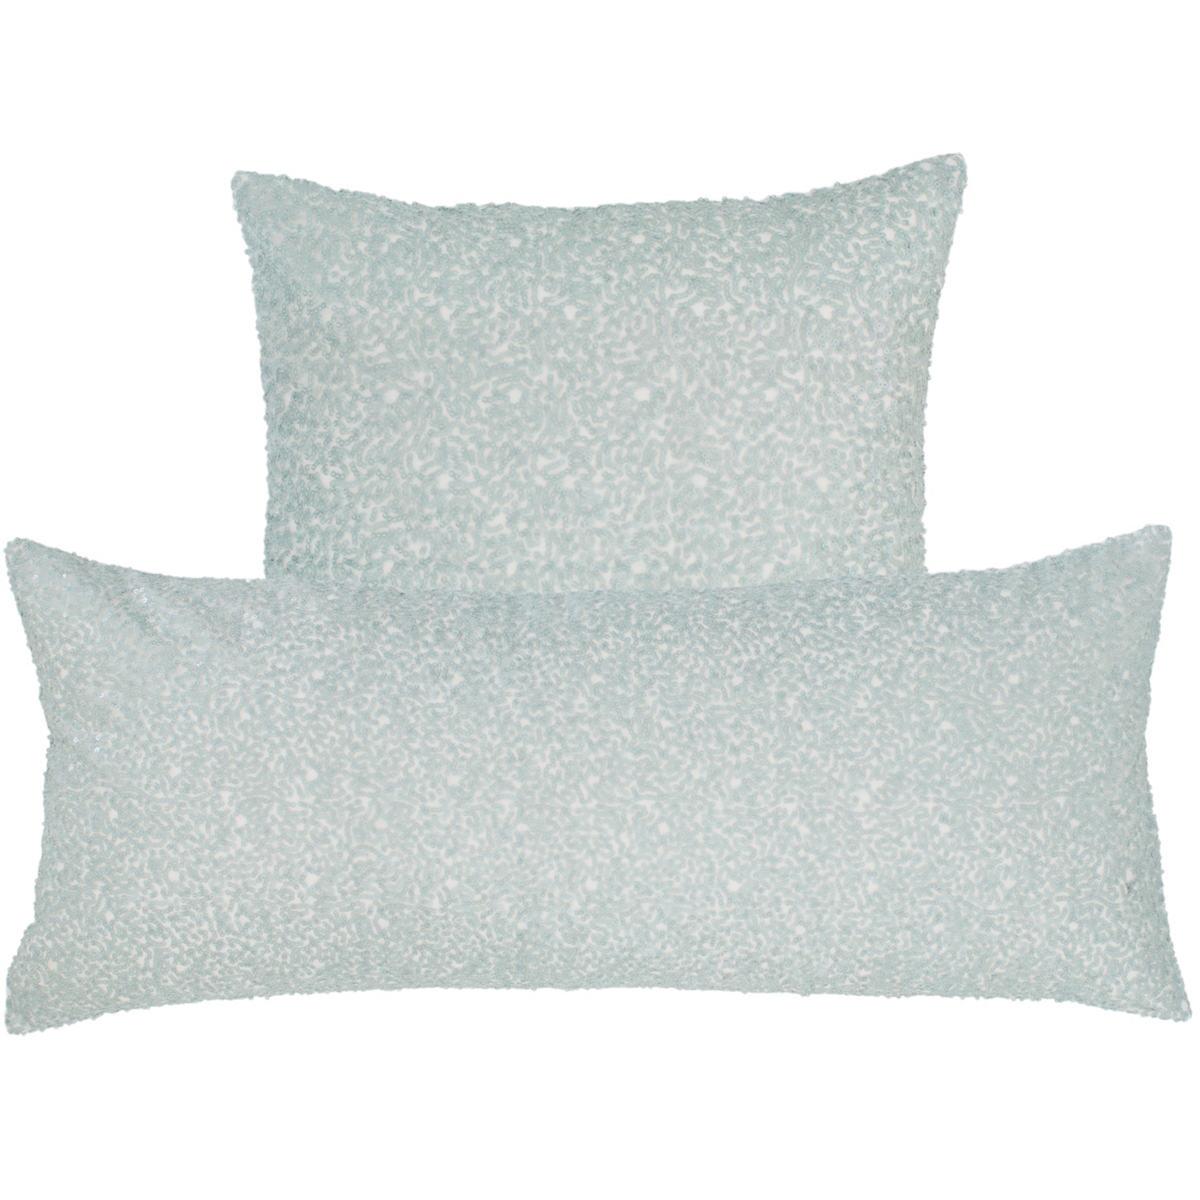 Glaze Sequin Robin's Egg Blue Decorative Pillow